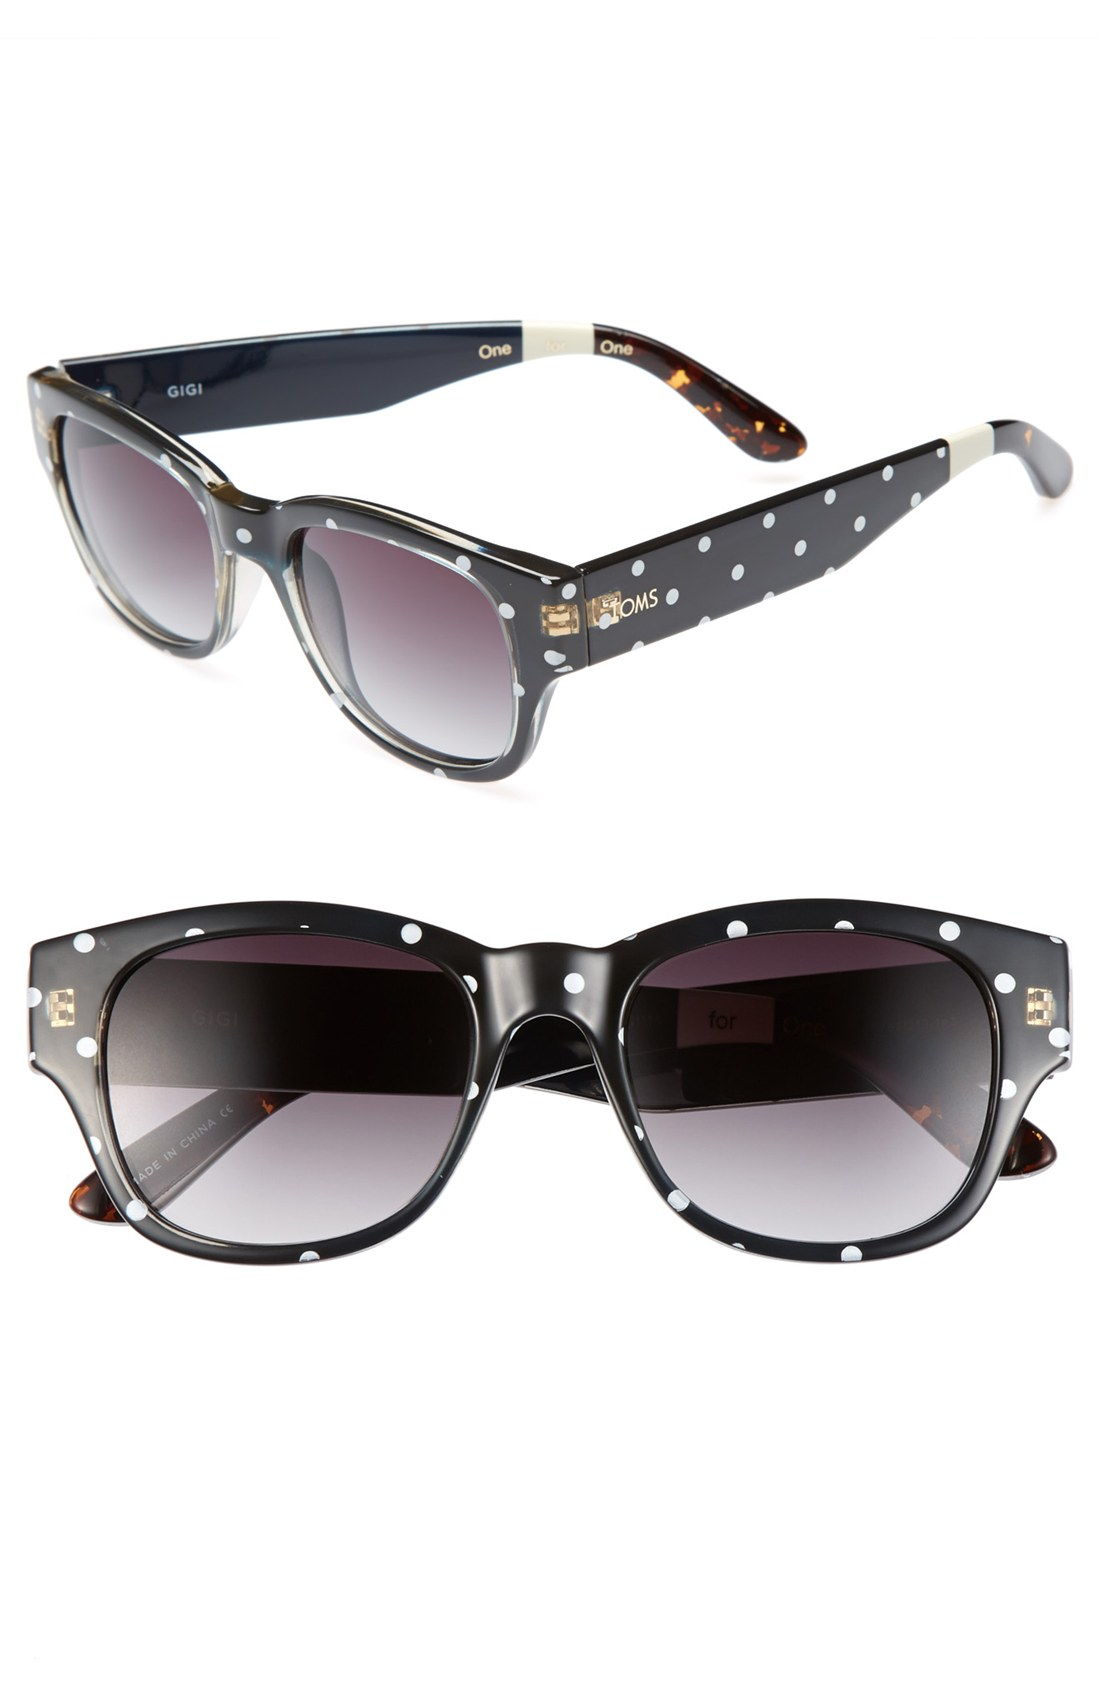 Toms Gigi 52mm Sunglasses in Black | Lyst